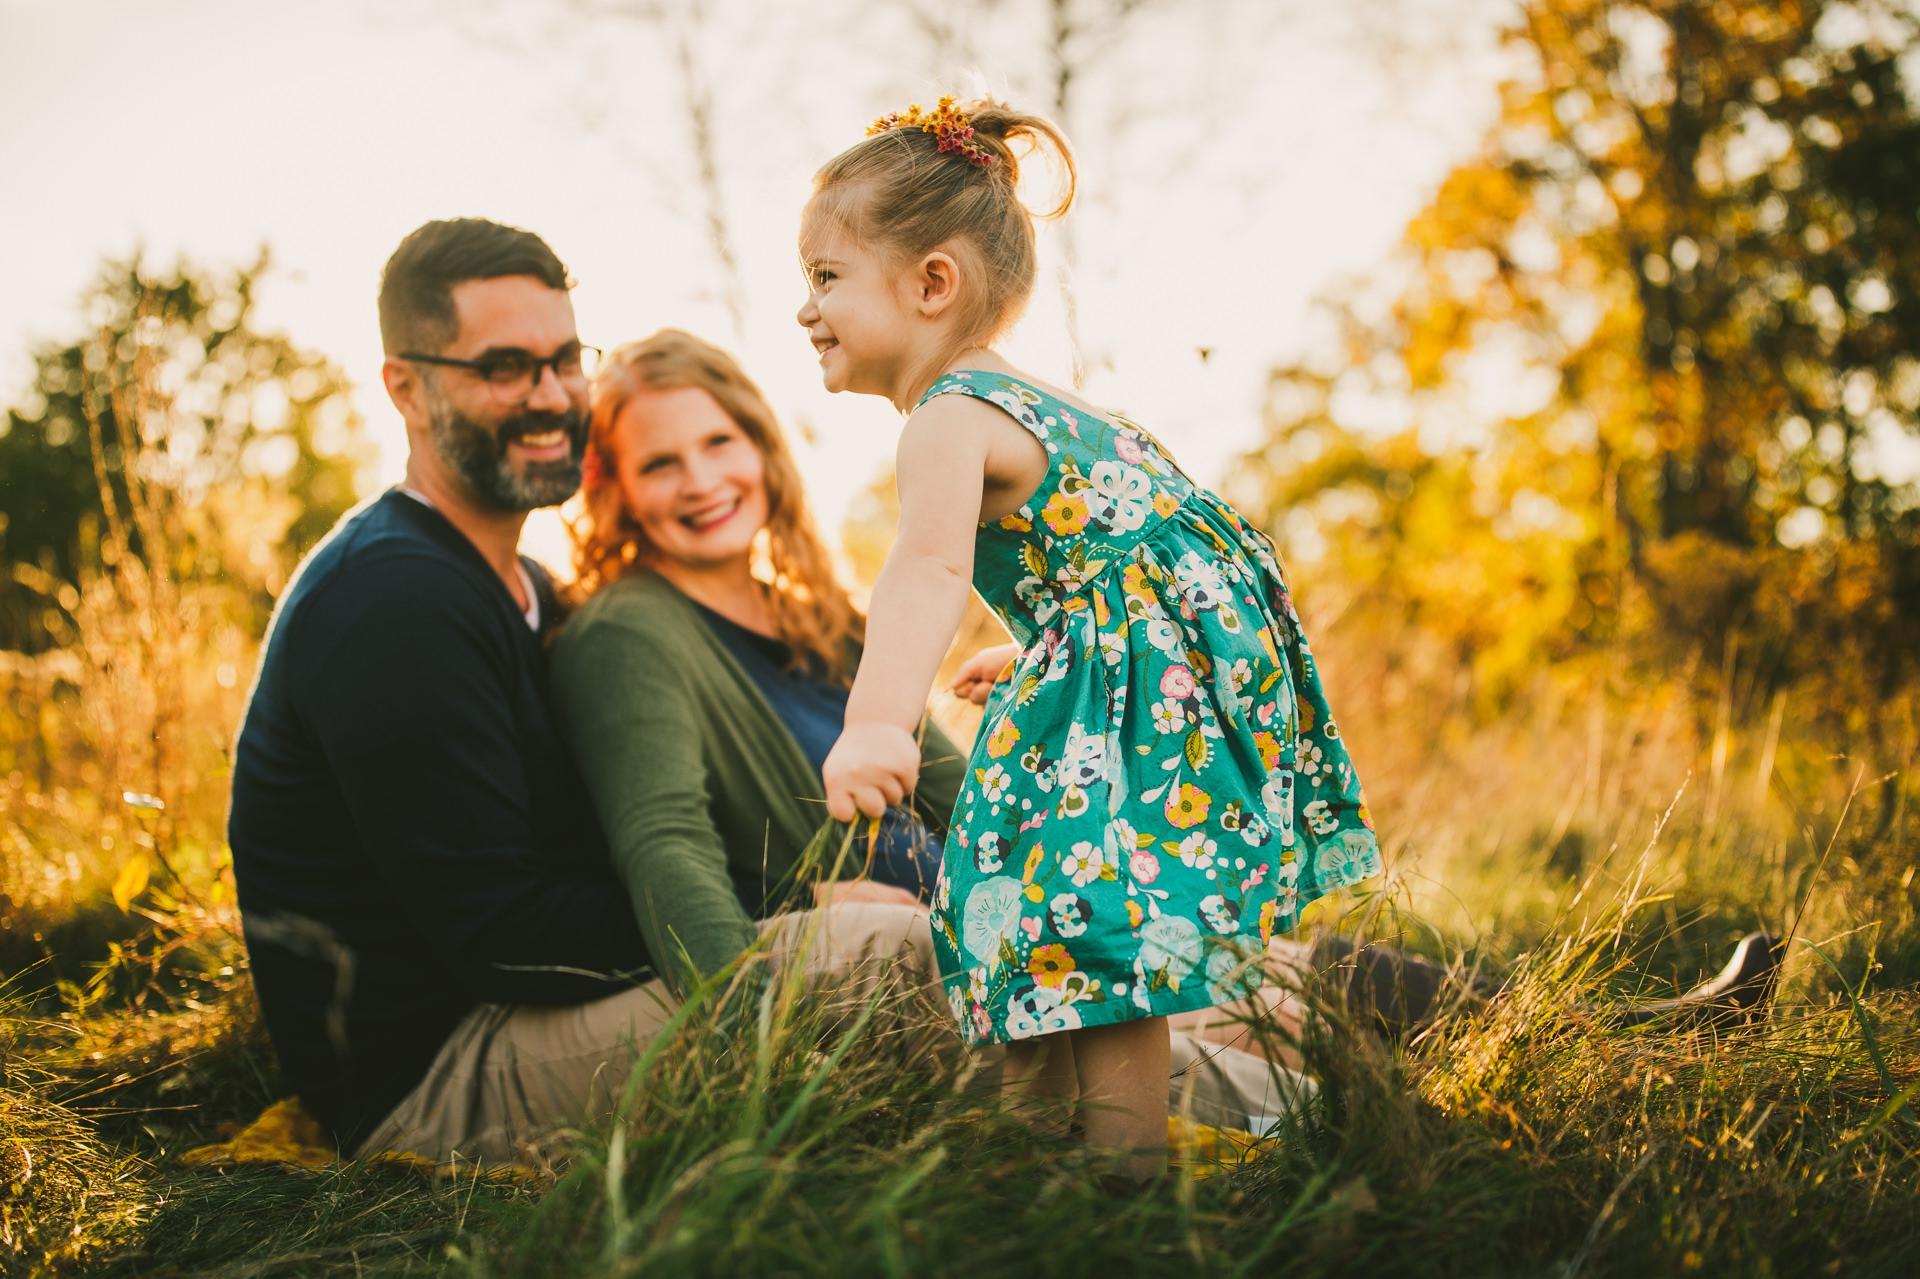 Lakewood Family Fall Portrait Photographer 7.jpg